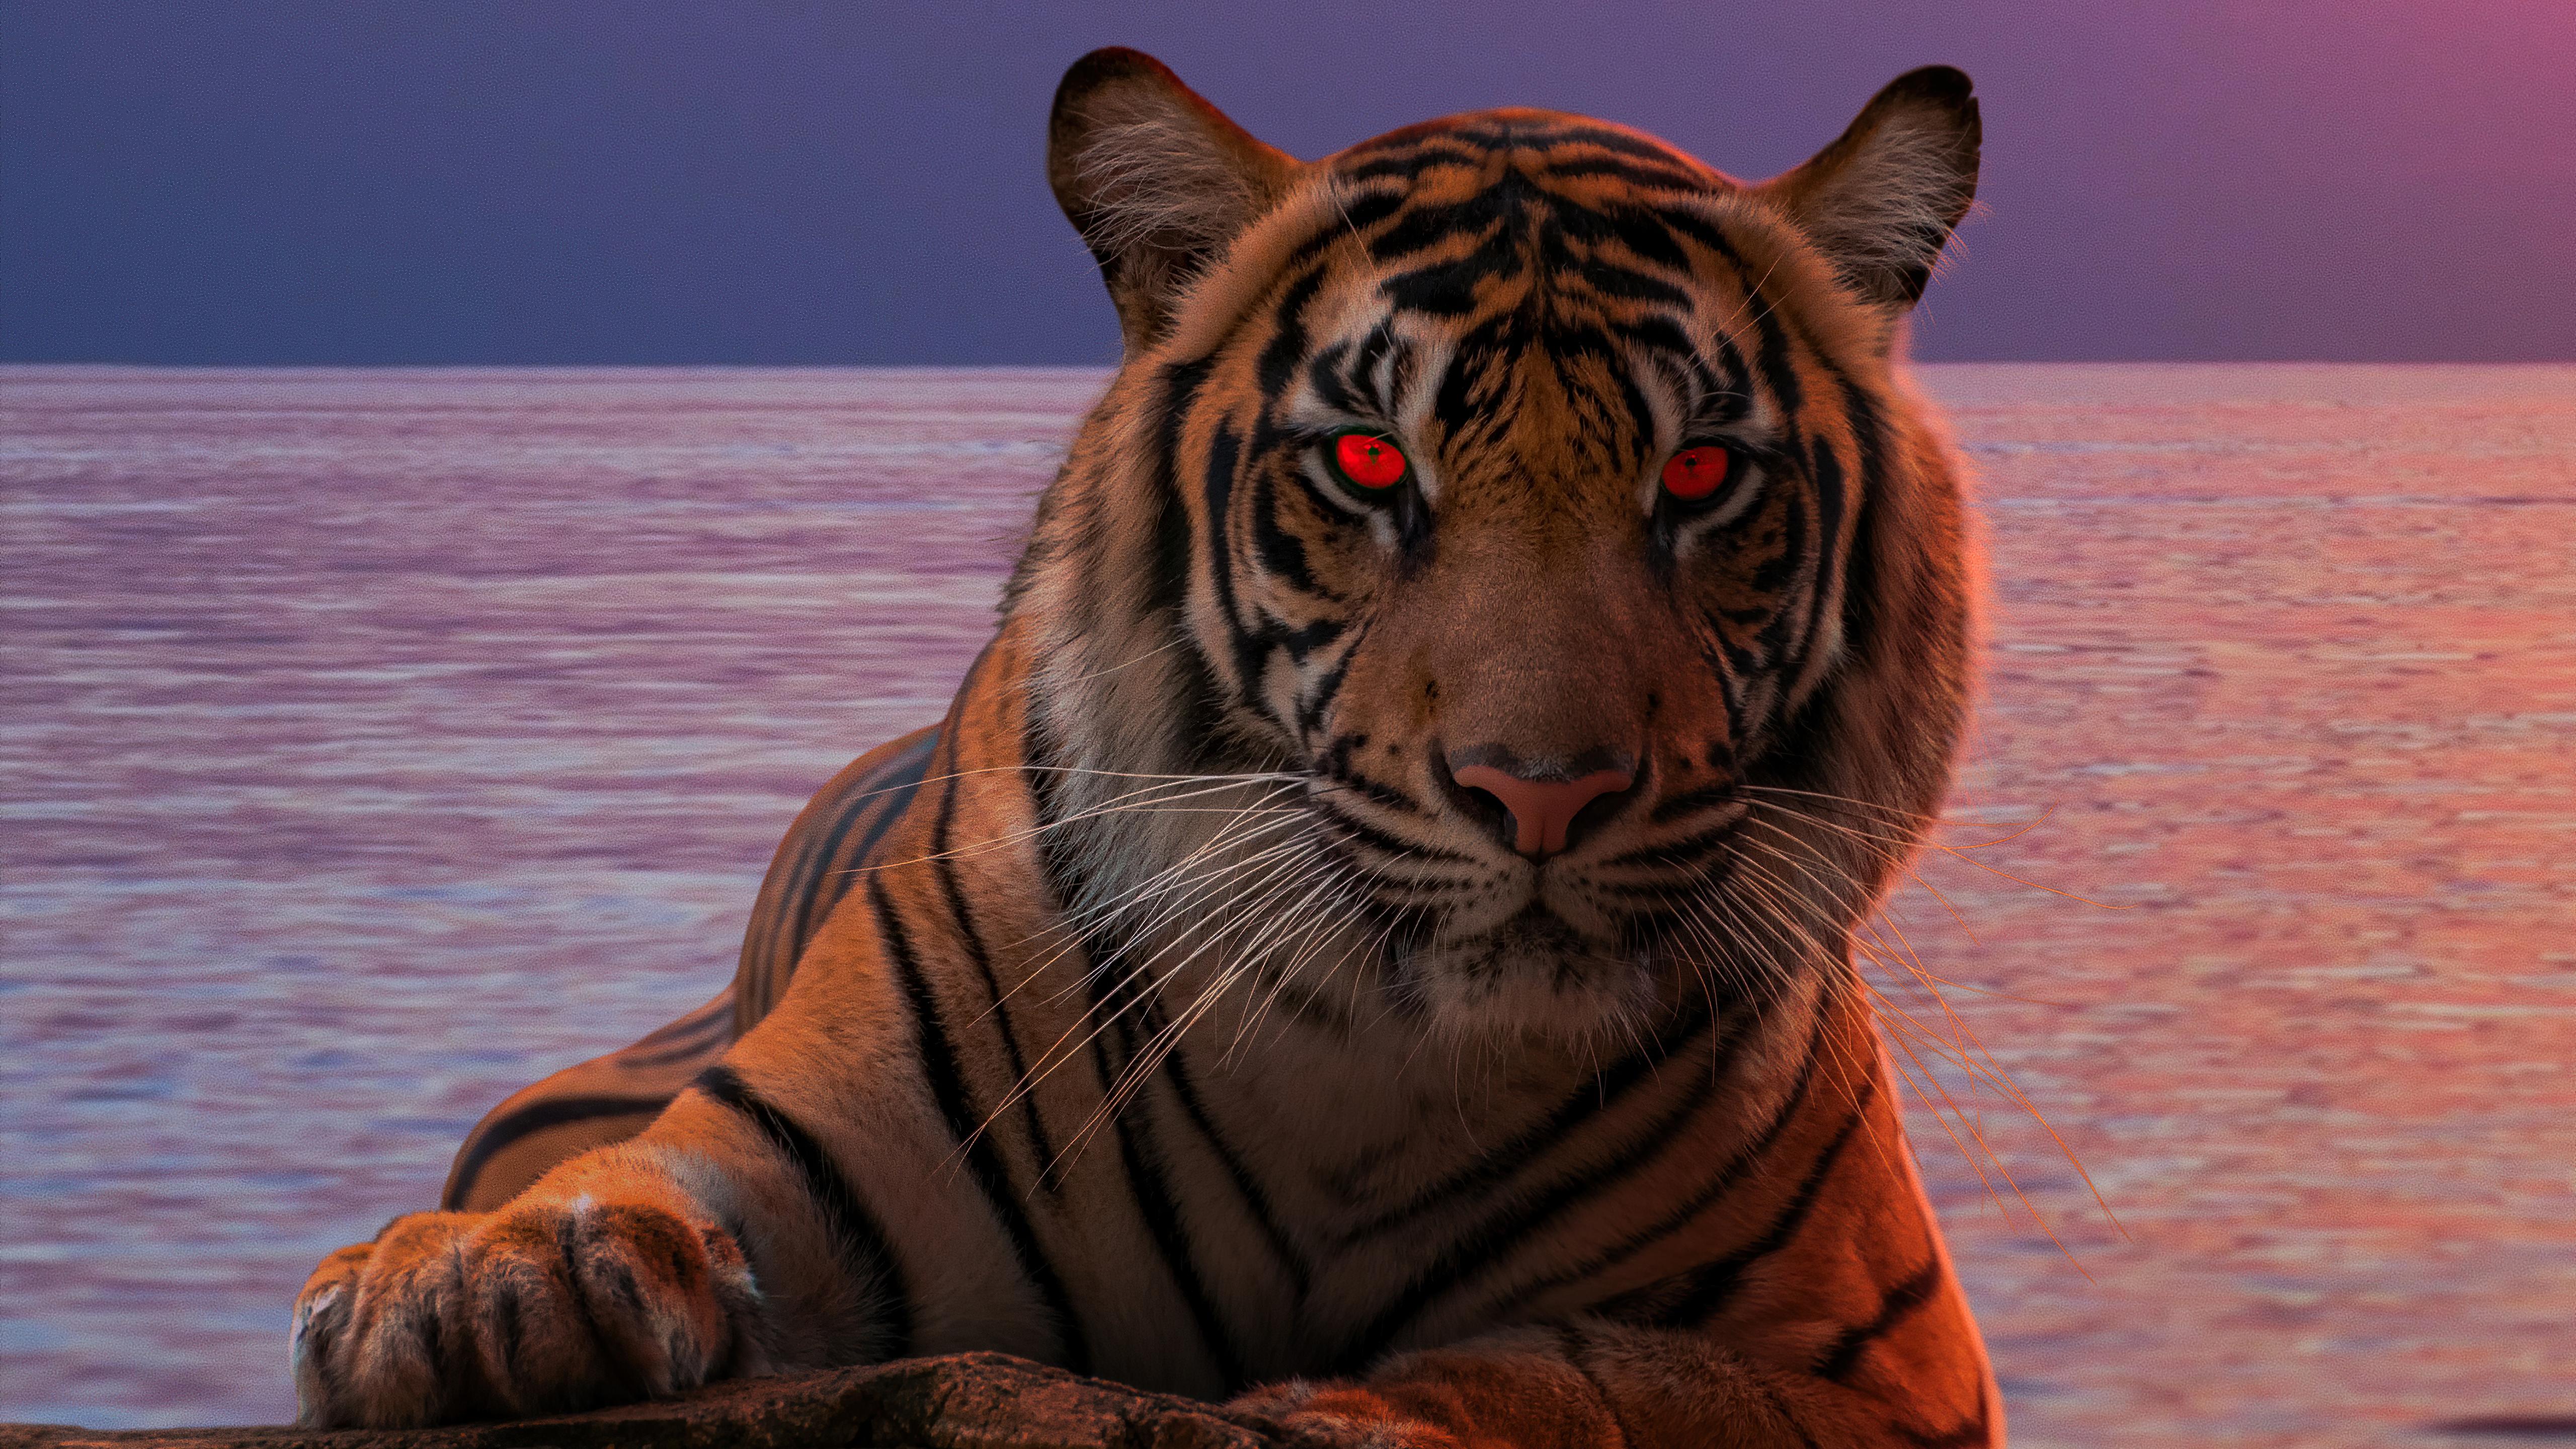 tiger glowing red eyes 4k 1616872018 - Tiger Glowing Red Eyes 4k - Tiger Glowing Red Eyes 4k wallpapers